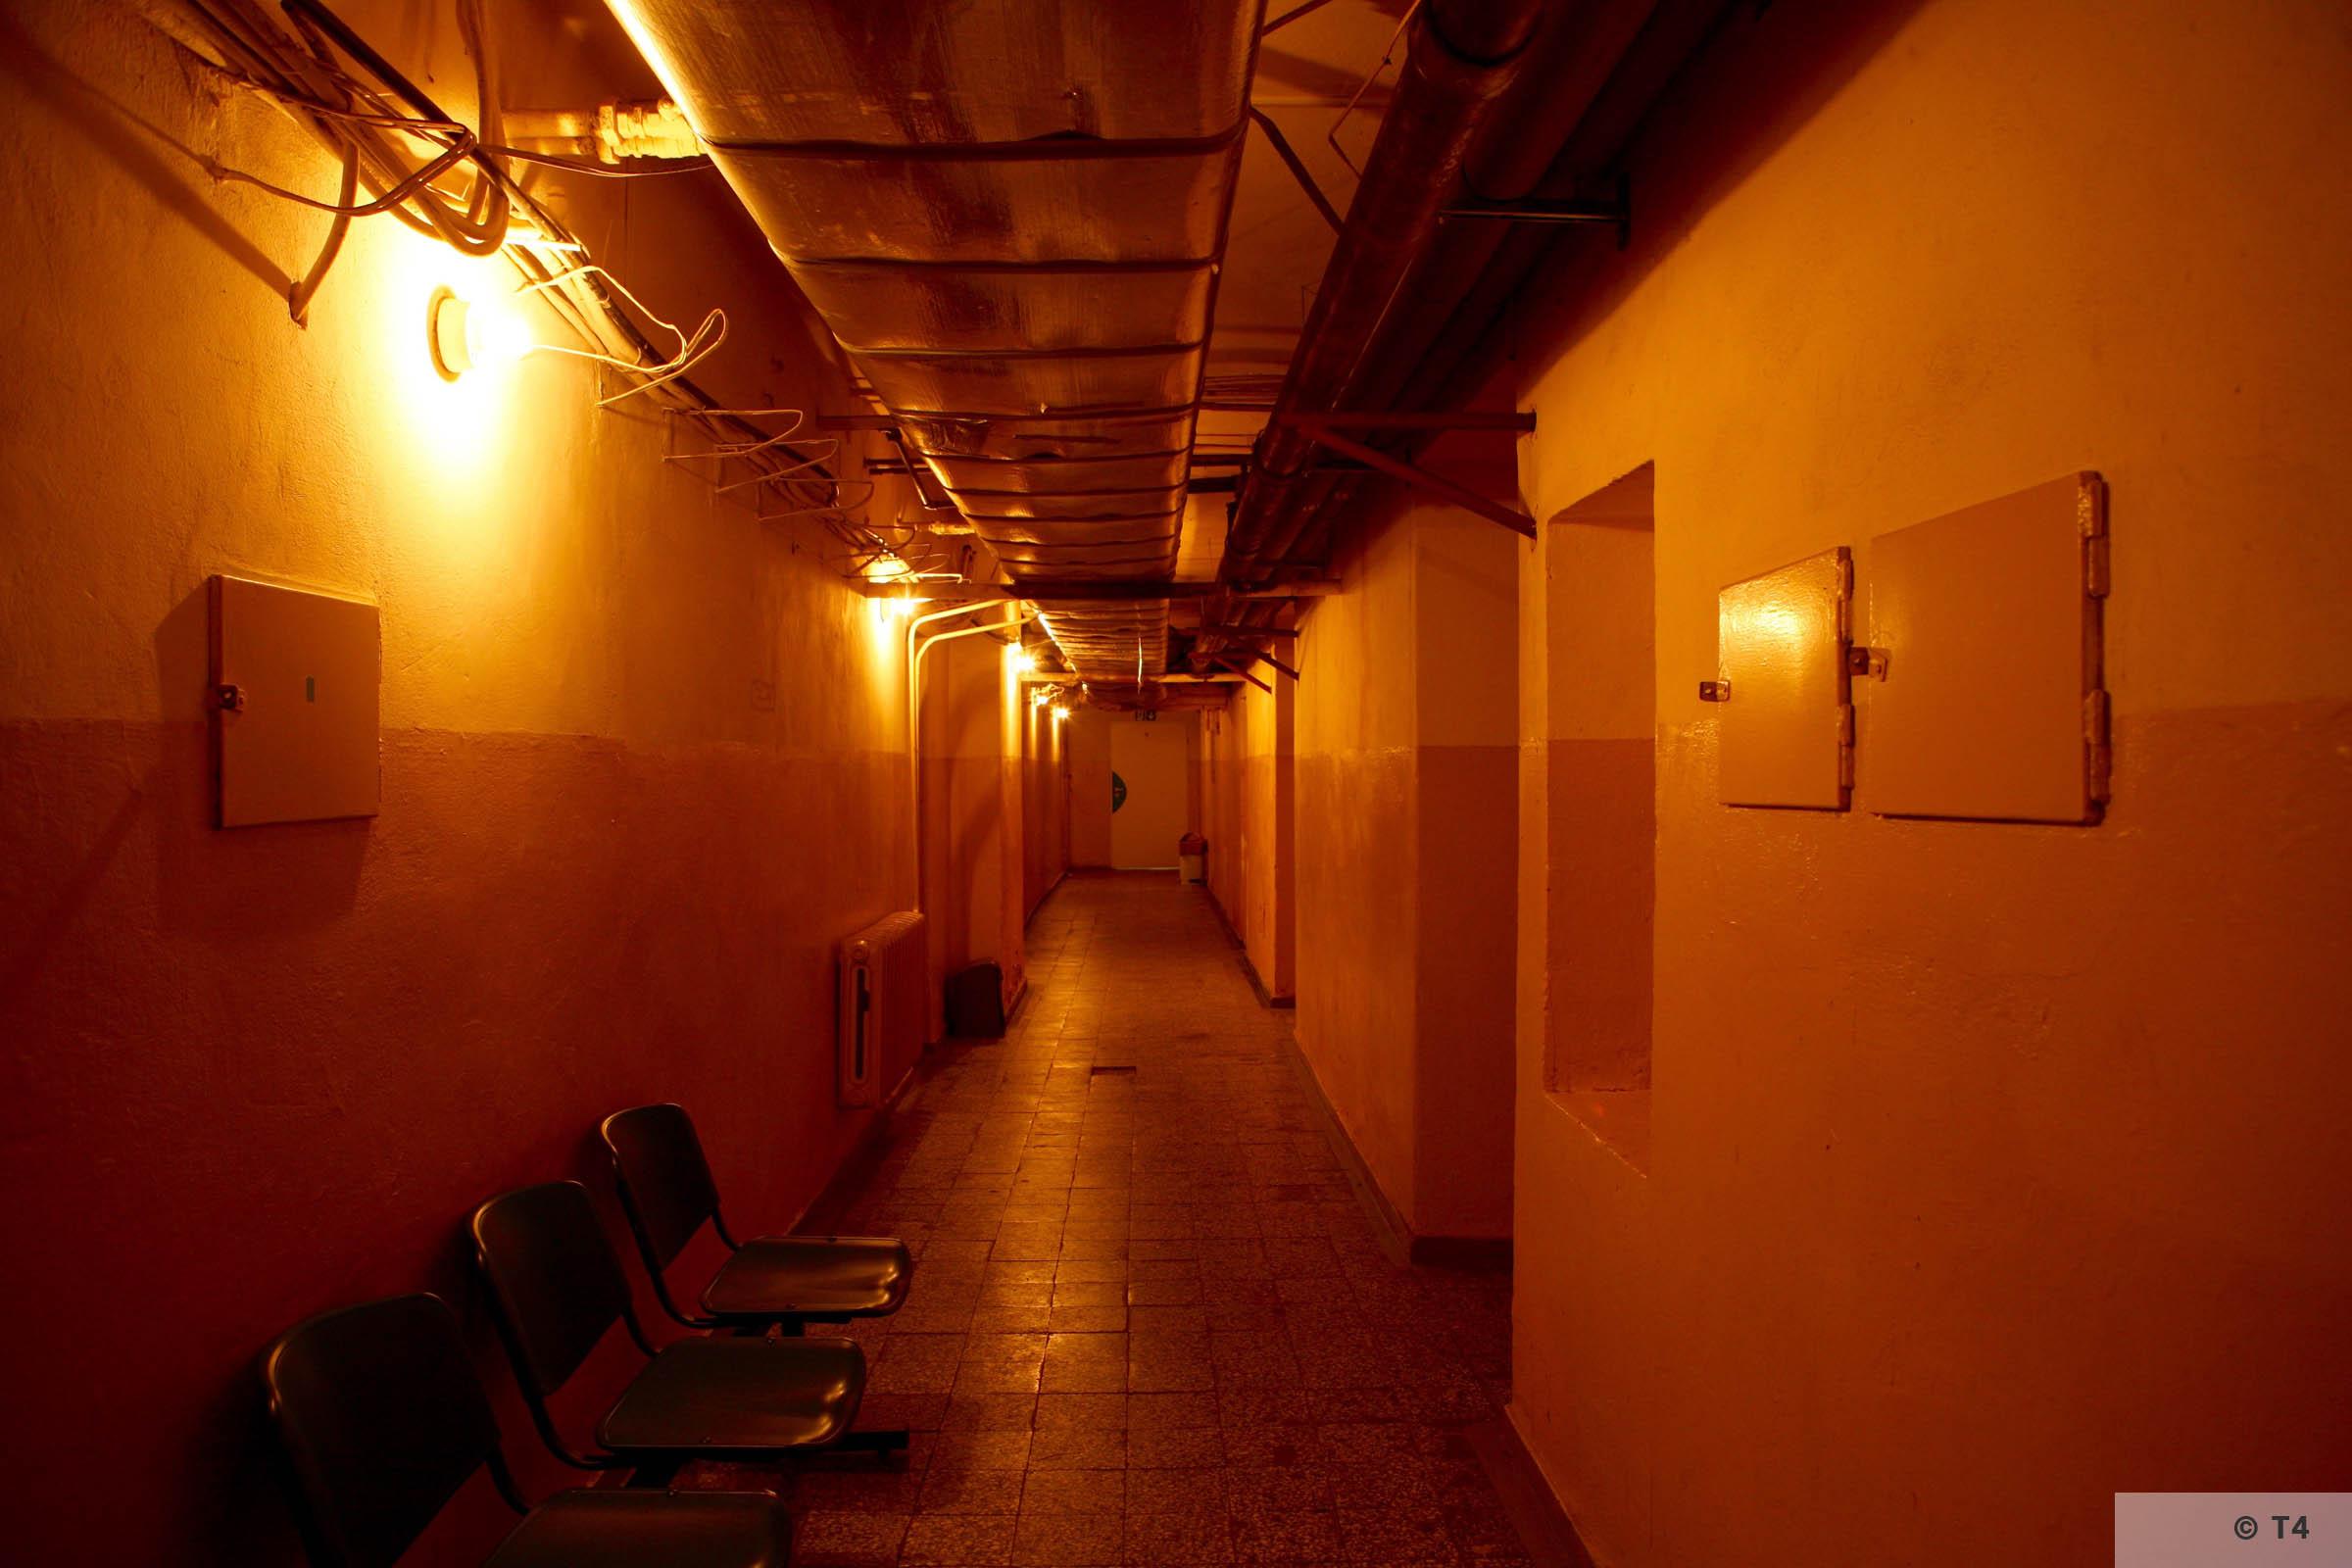 Cellar of former Gestapo headquarters in Katowice. 2007 T4 5724